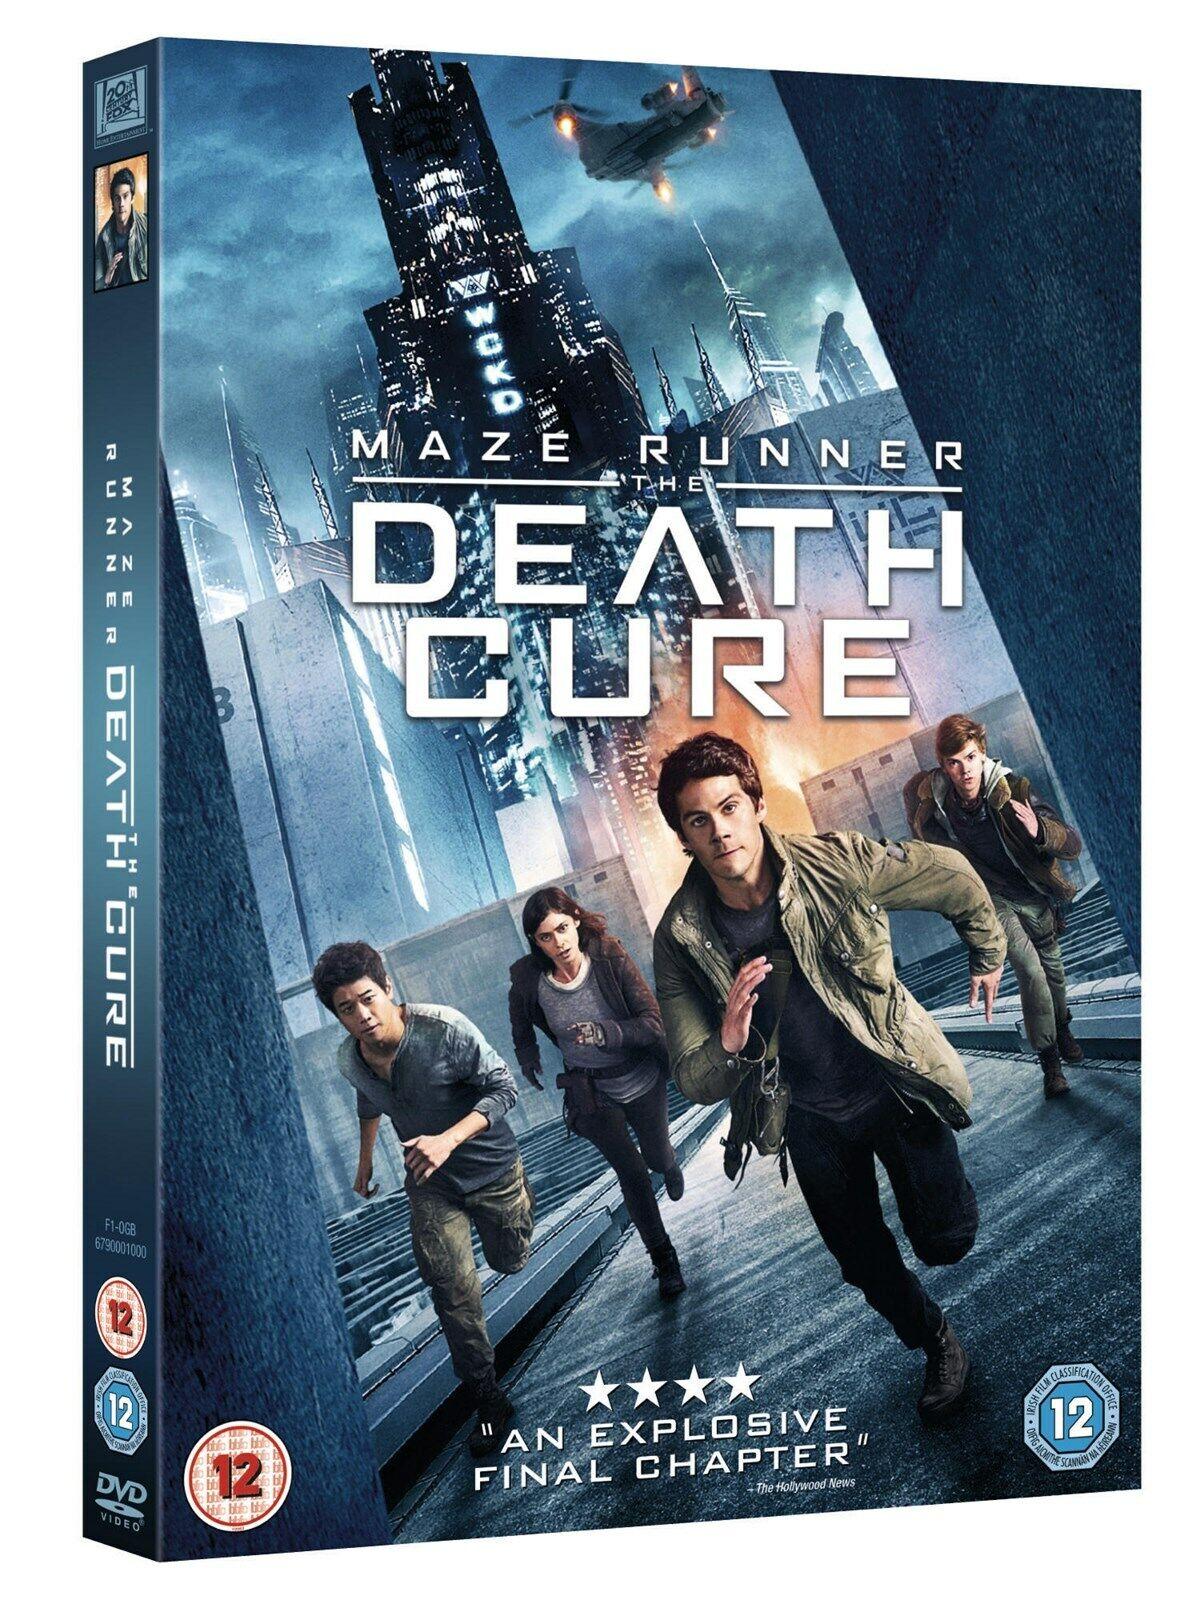 Maze Runner The Death Cure 2018 Genuine Uk R2 Dvd Fast Post Immediate Dispatch For Sale Online Ebay